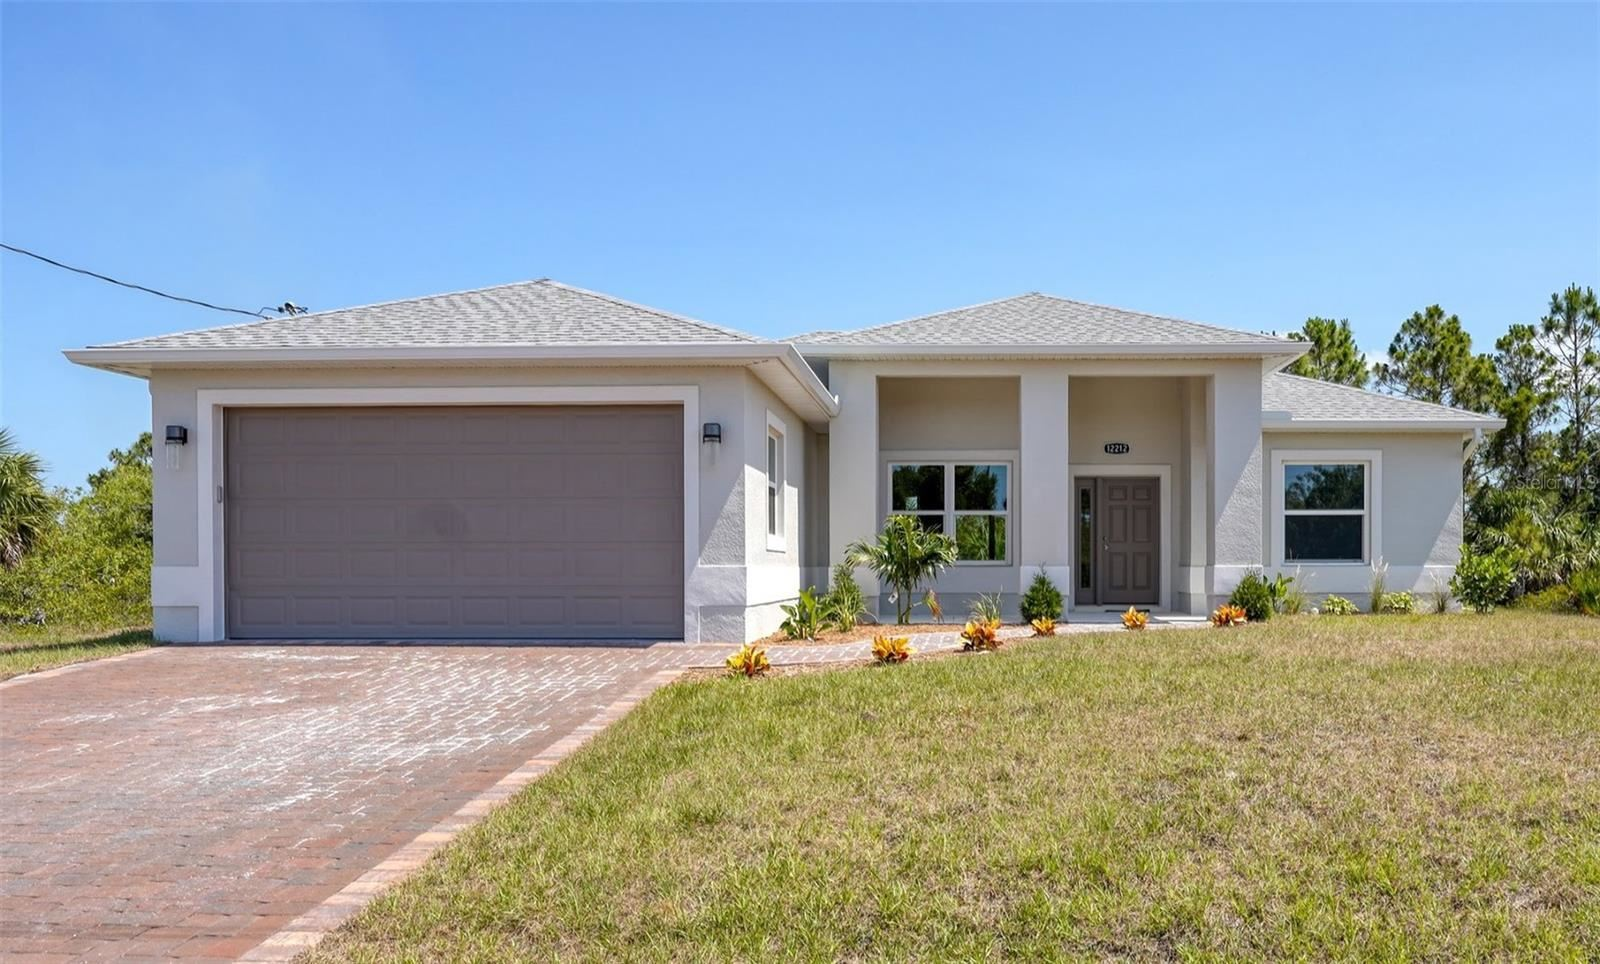 Photo of 7410 ELLIS LANE, PORT CHARLOTTE, FL 33981 (MLS # D6120184)